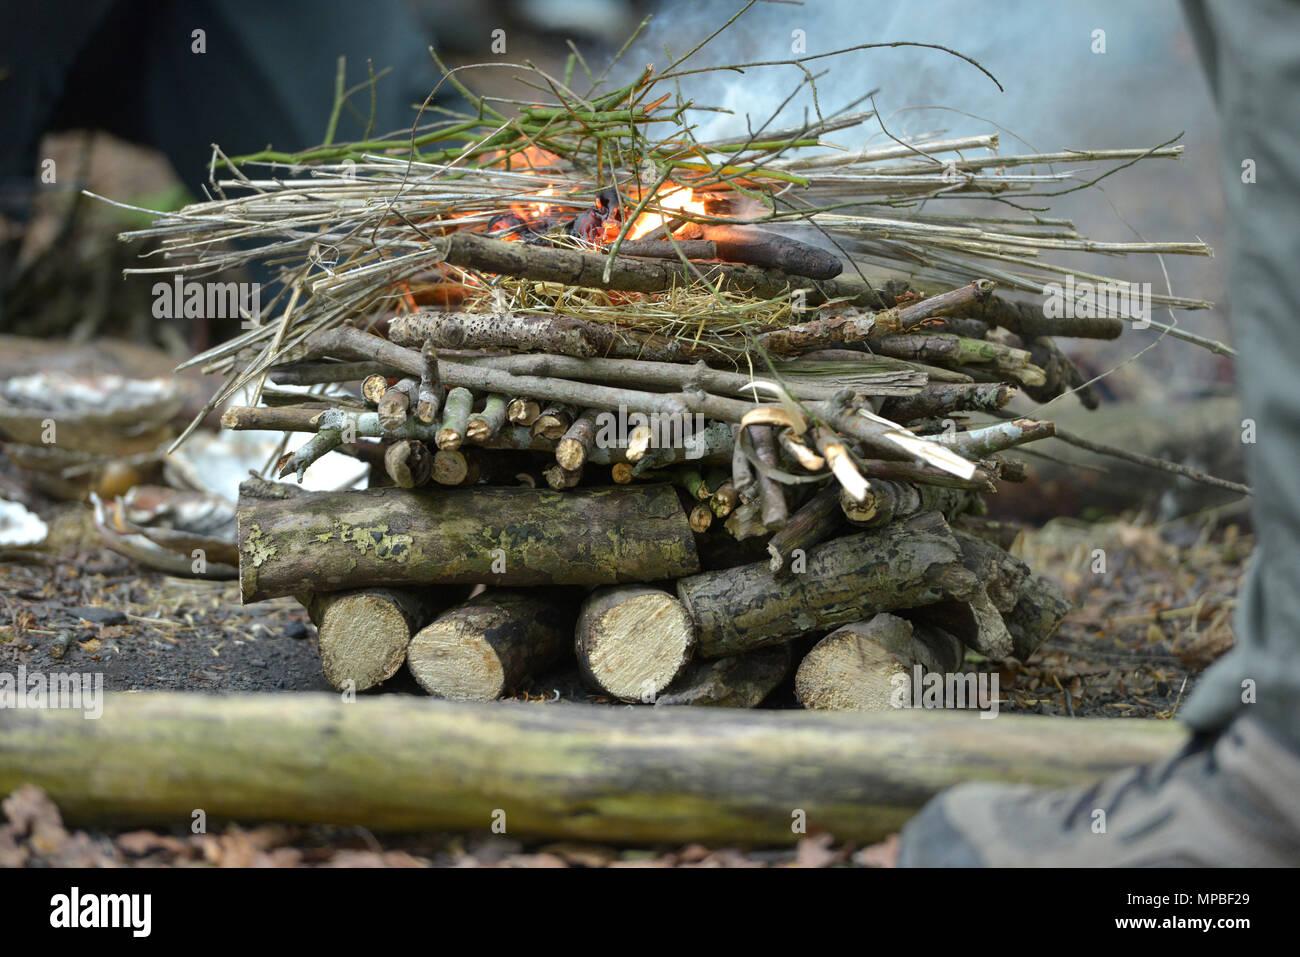 Campfire starting to burn. - Stock Image